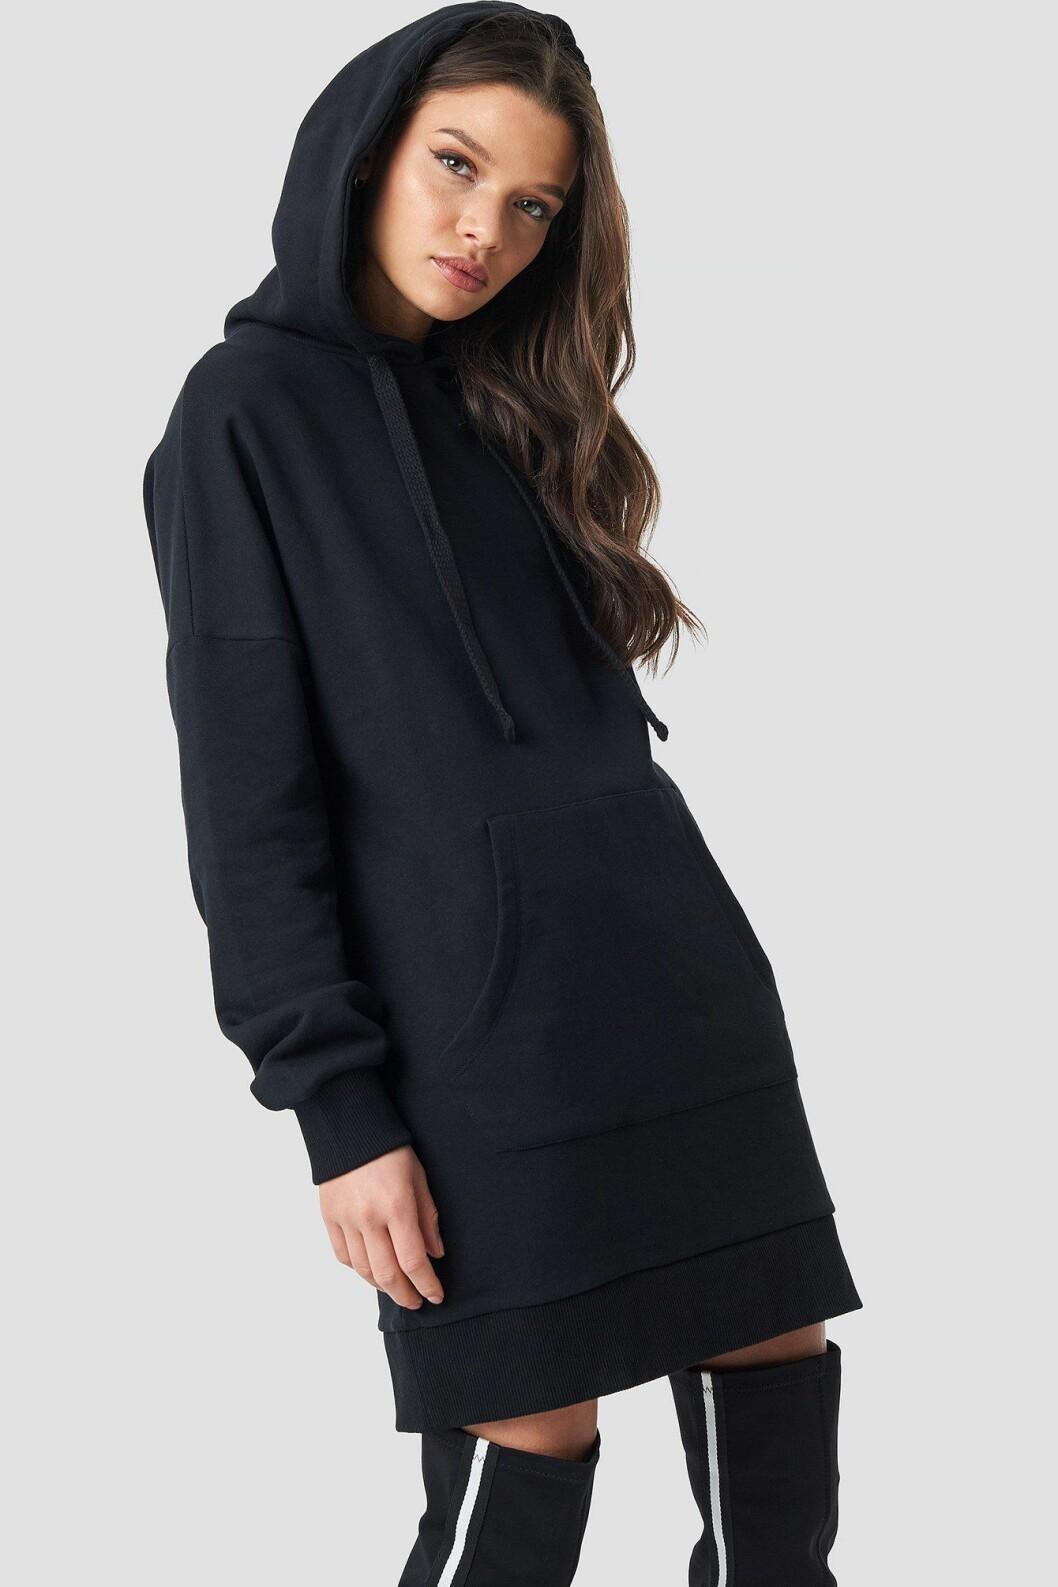 Linn Ahlborg Na-kd svart hoodie